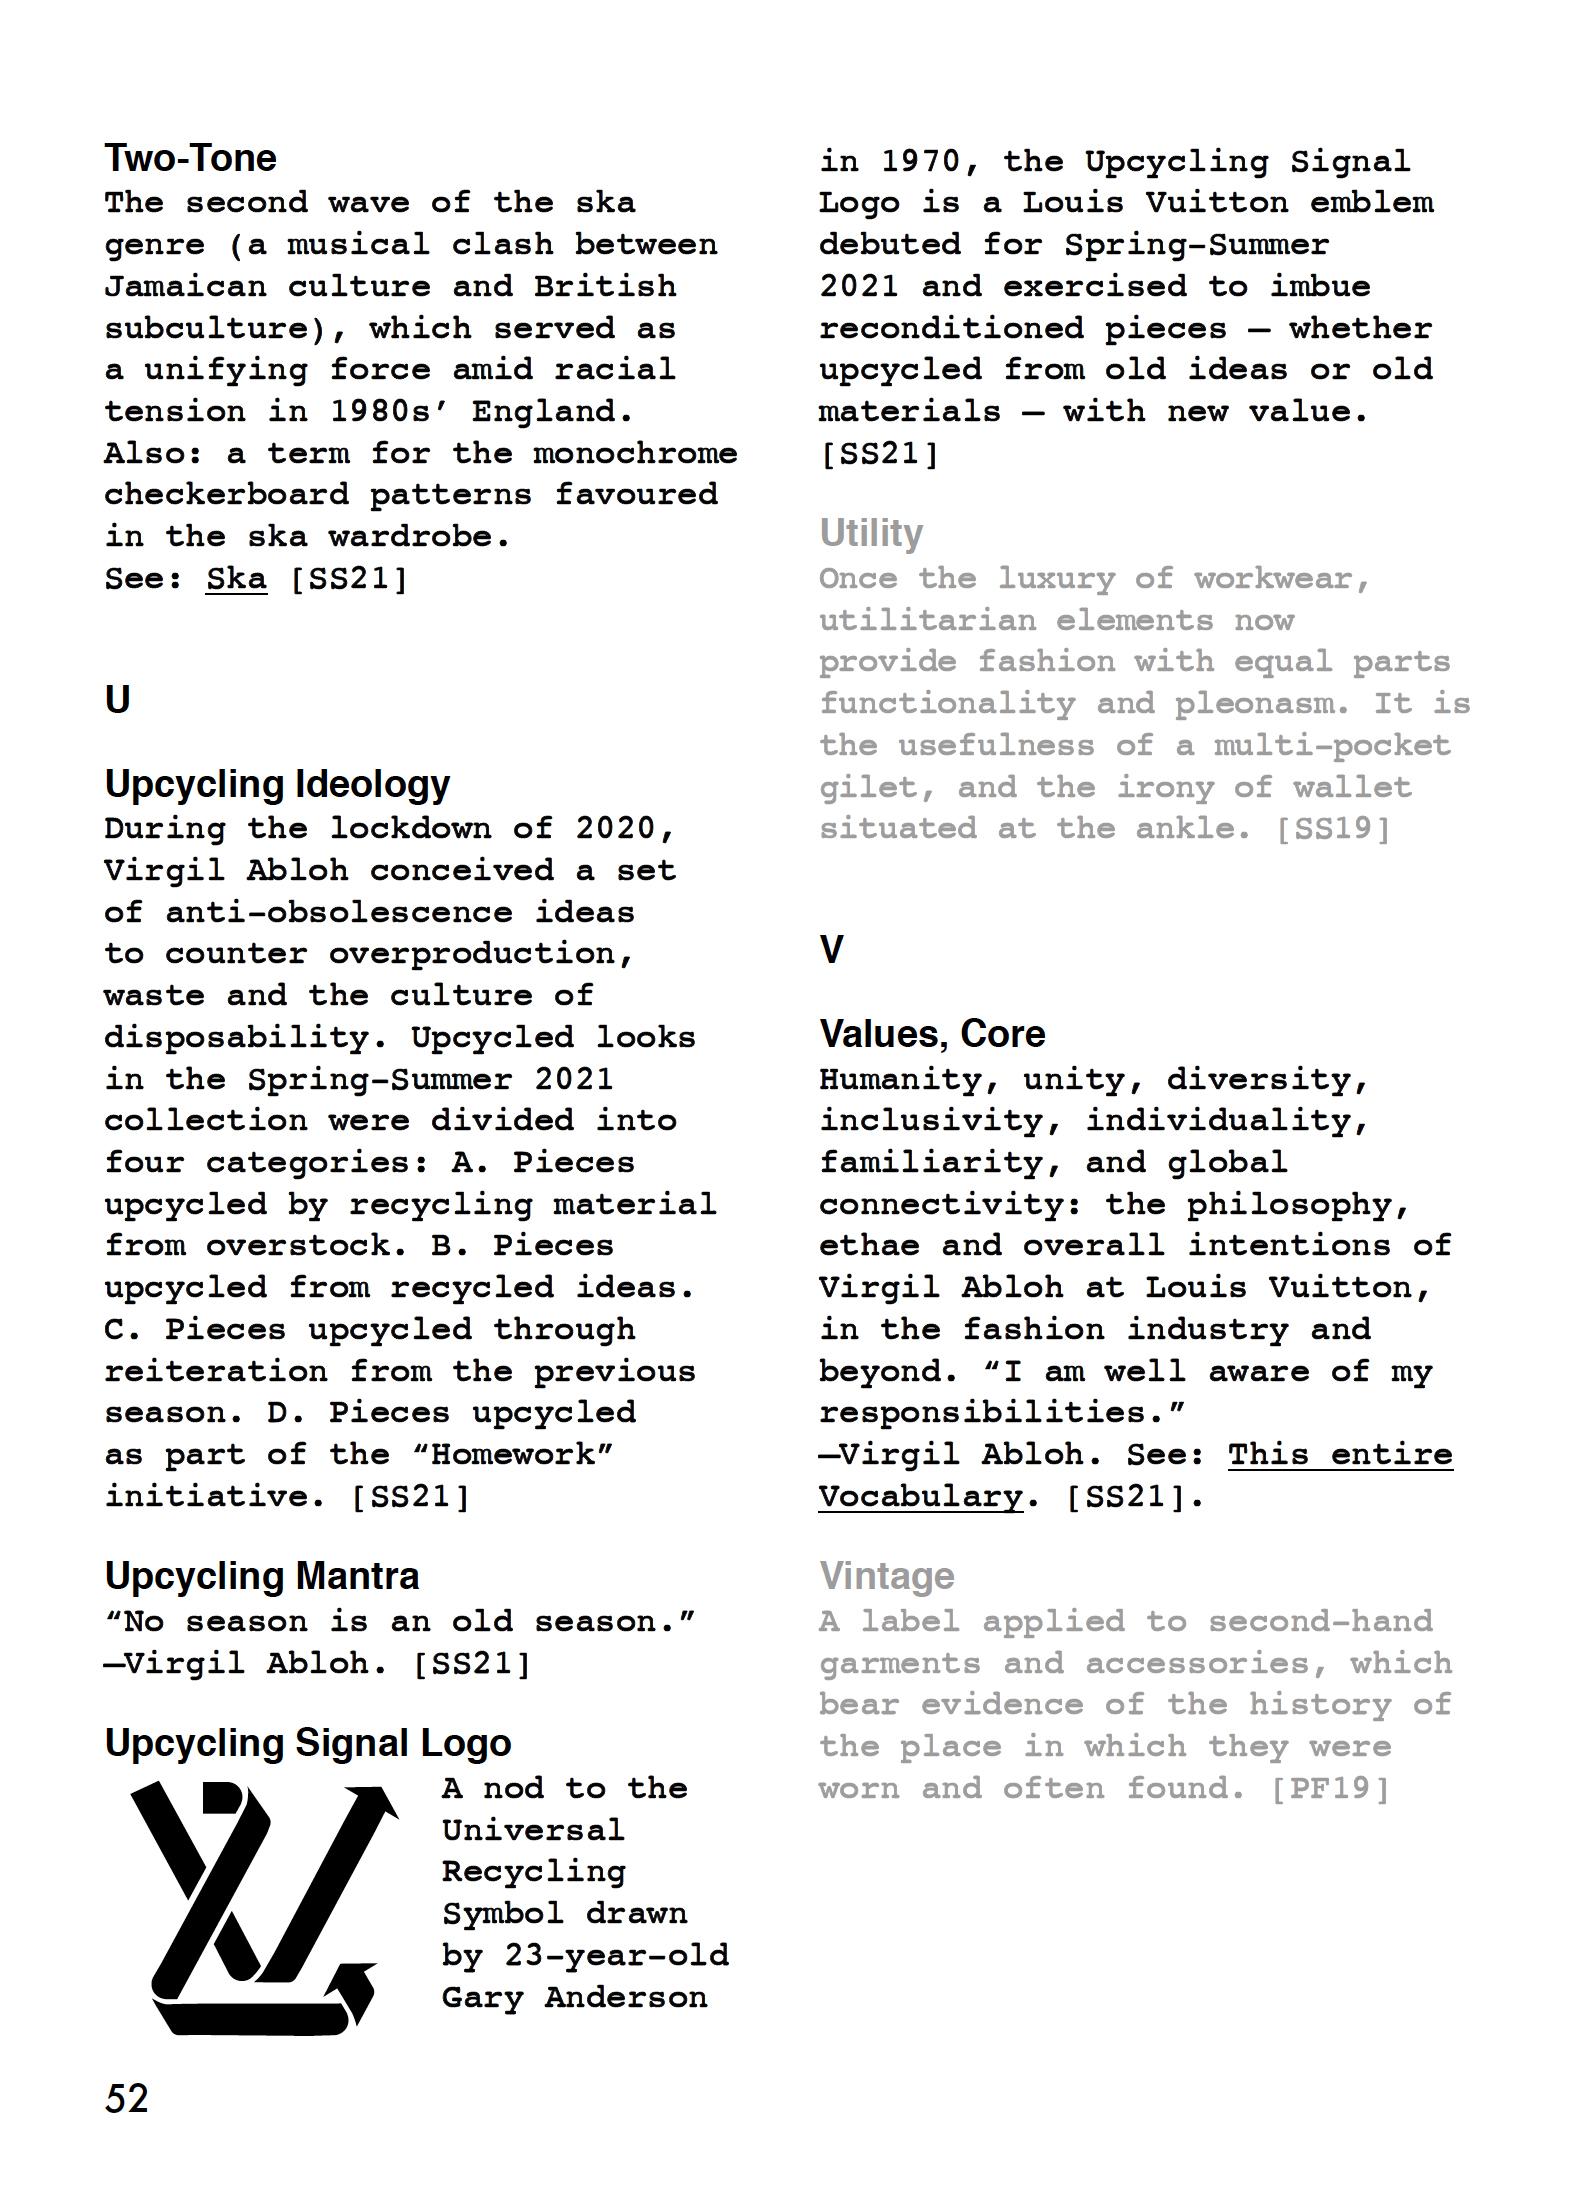 Louis Vuitton Mens News